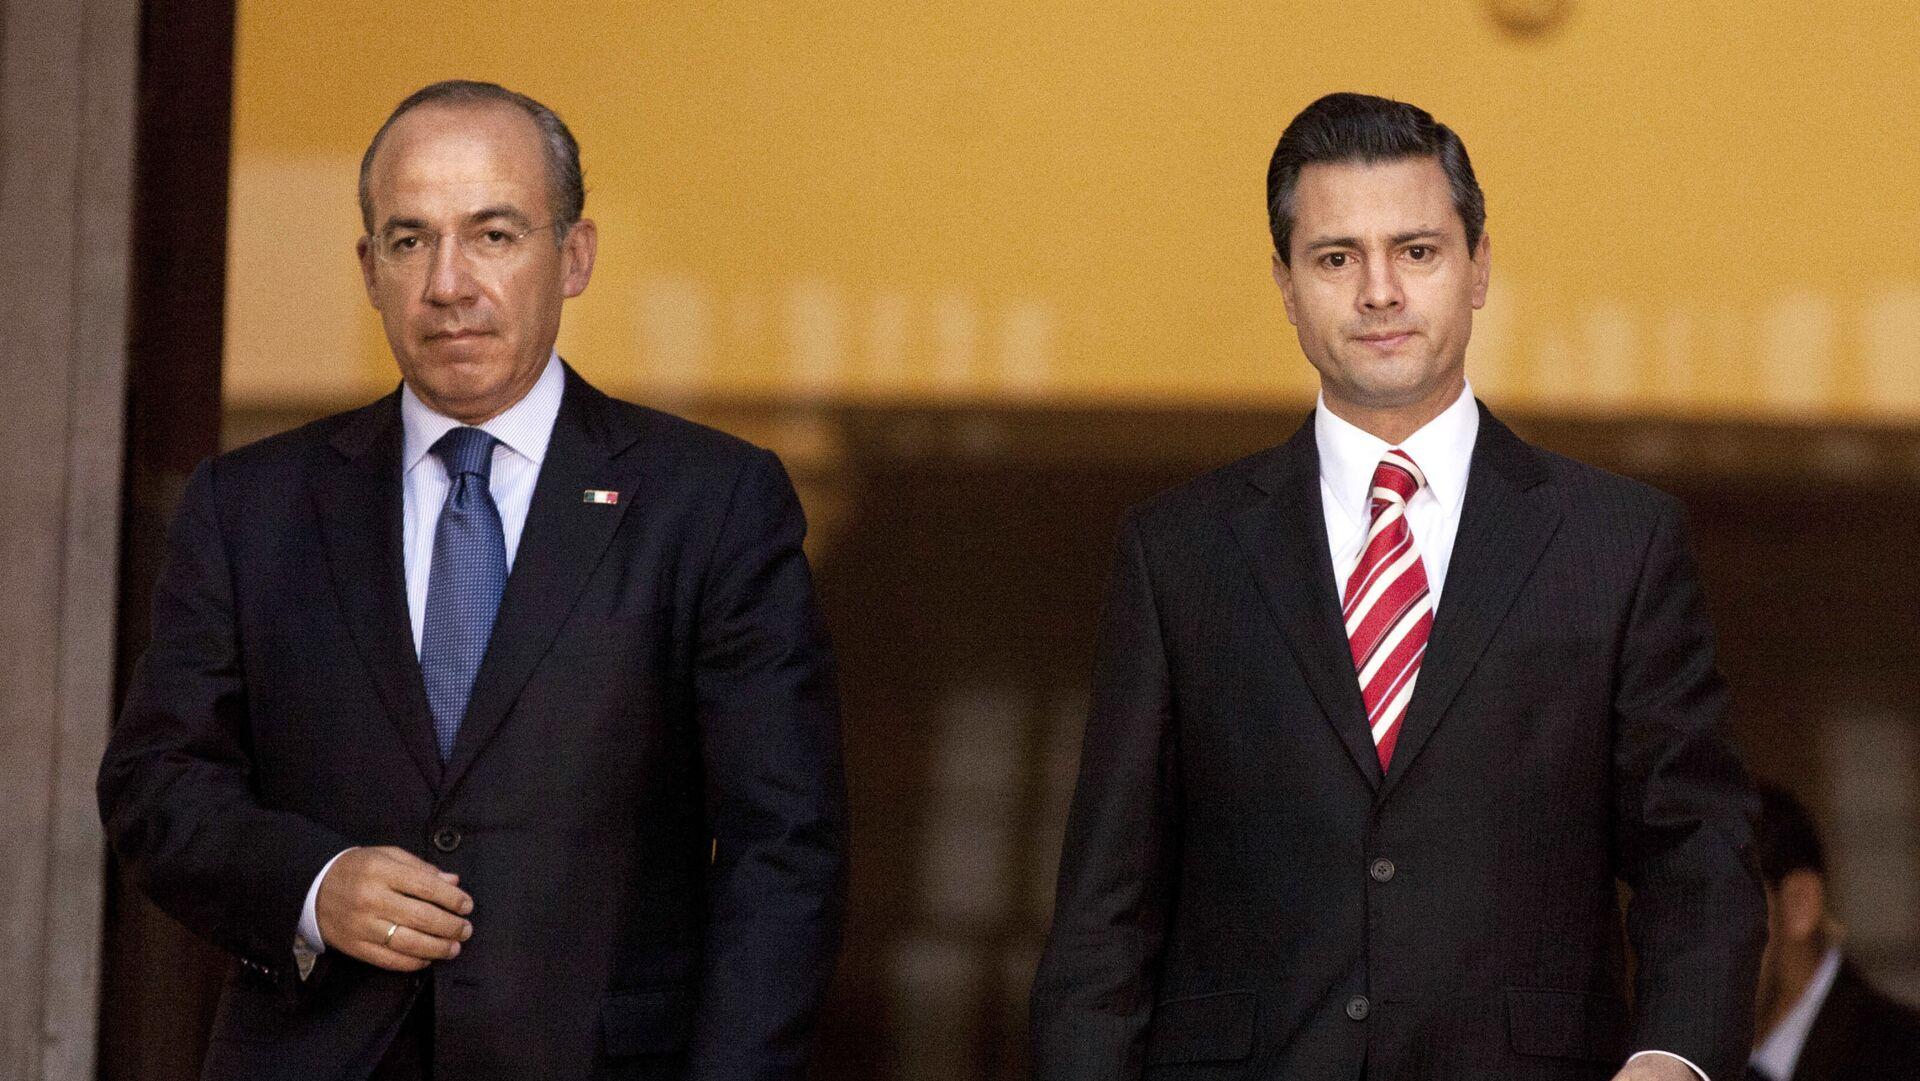 Felipe Calderón Hinojosa y Enrique Peña Nieto, expresidentes de México - Sputnik Mundo, 1920, 01.07.2021